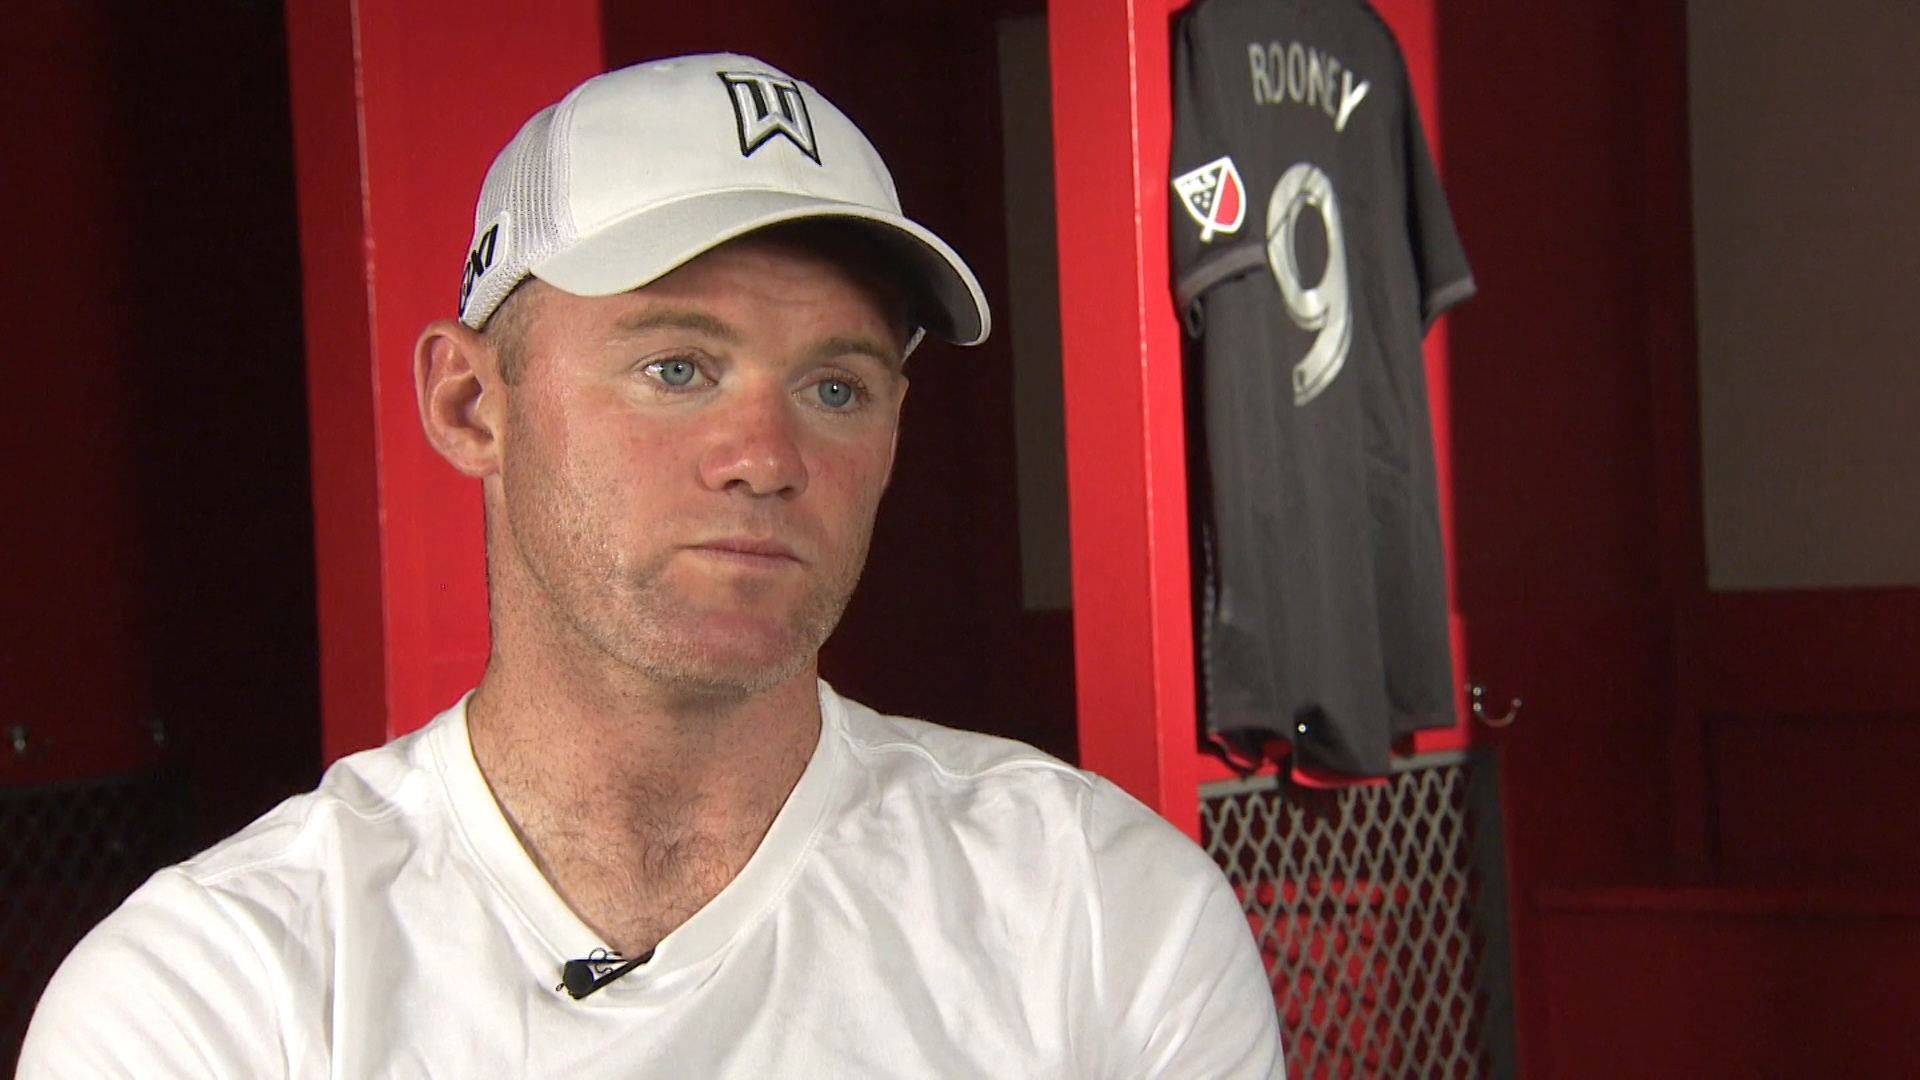 Wayne Rooney on Everton, Man Utd, England and the MLS